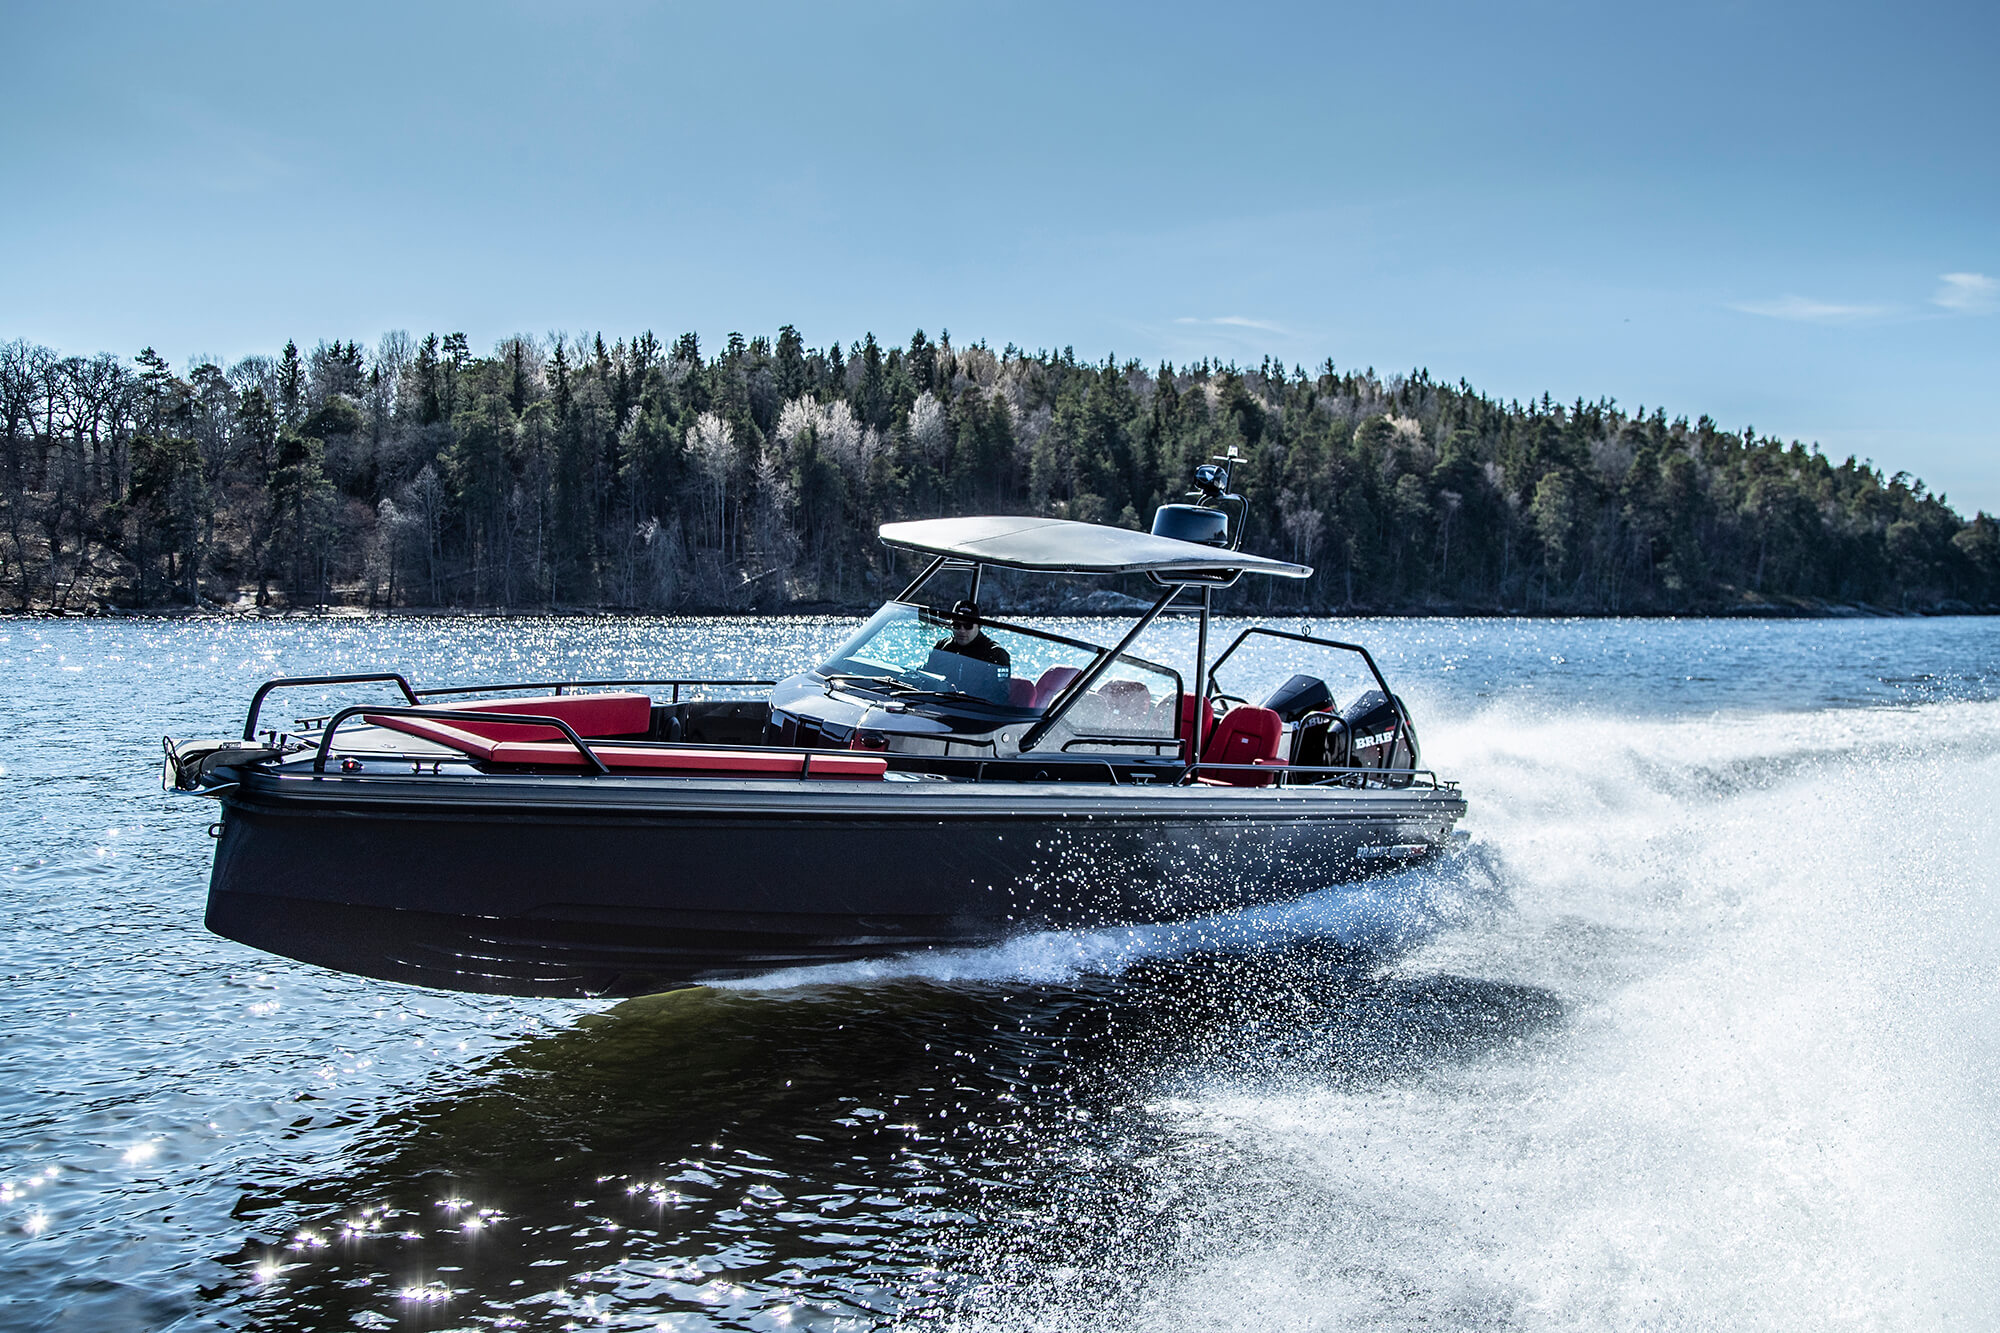 Brabus Shadow 500 Australia 30ft speed boat